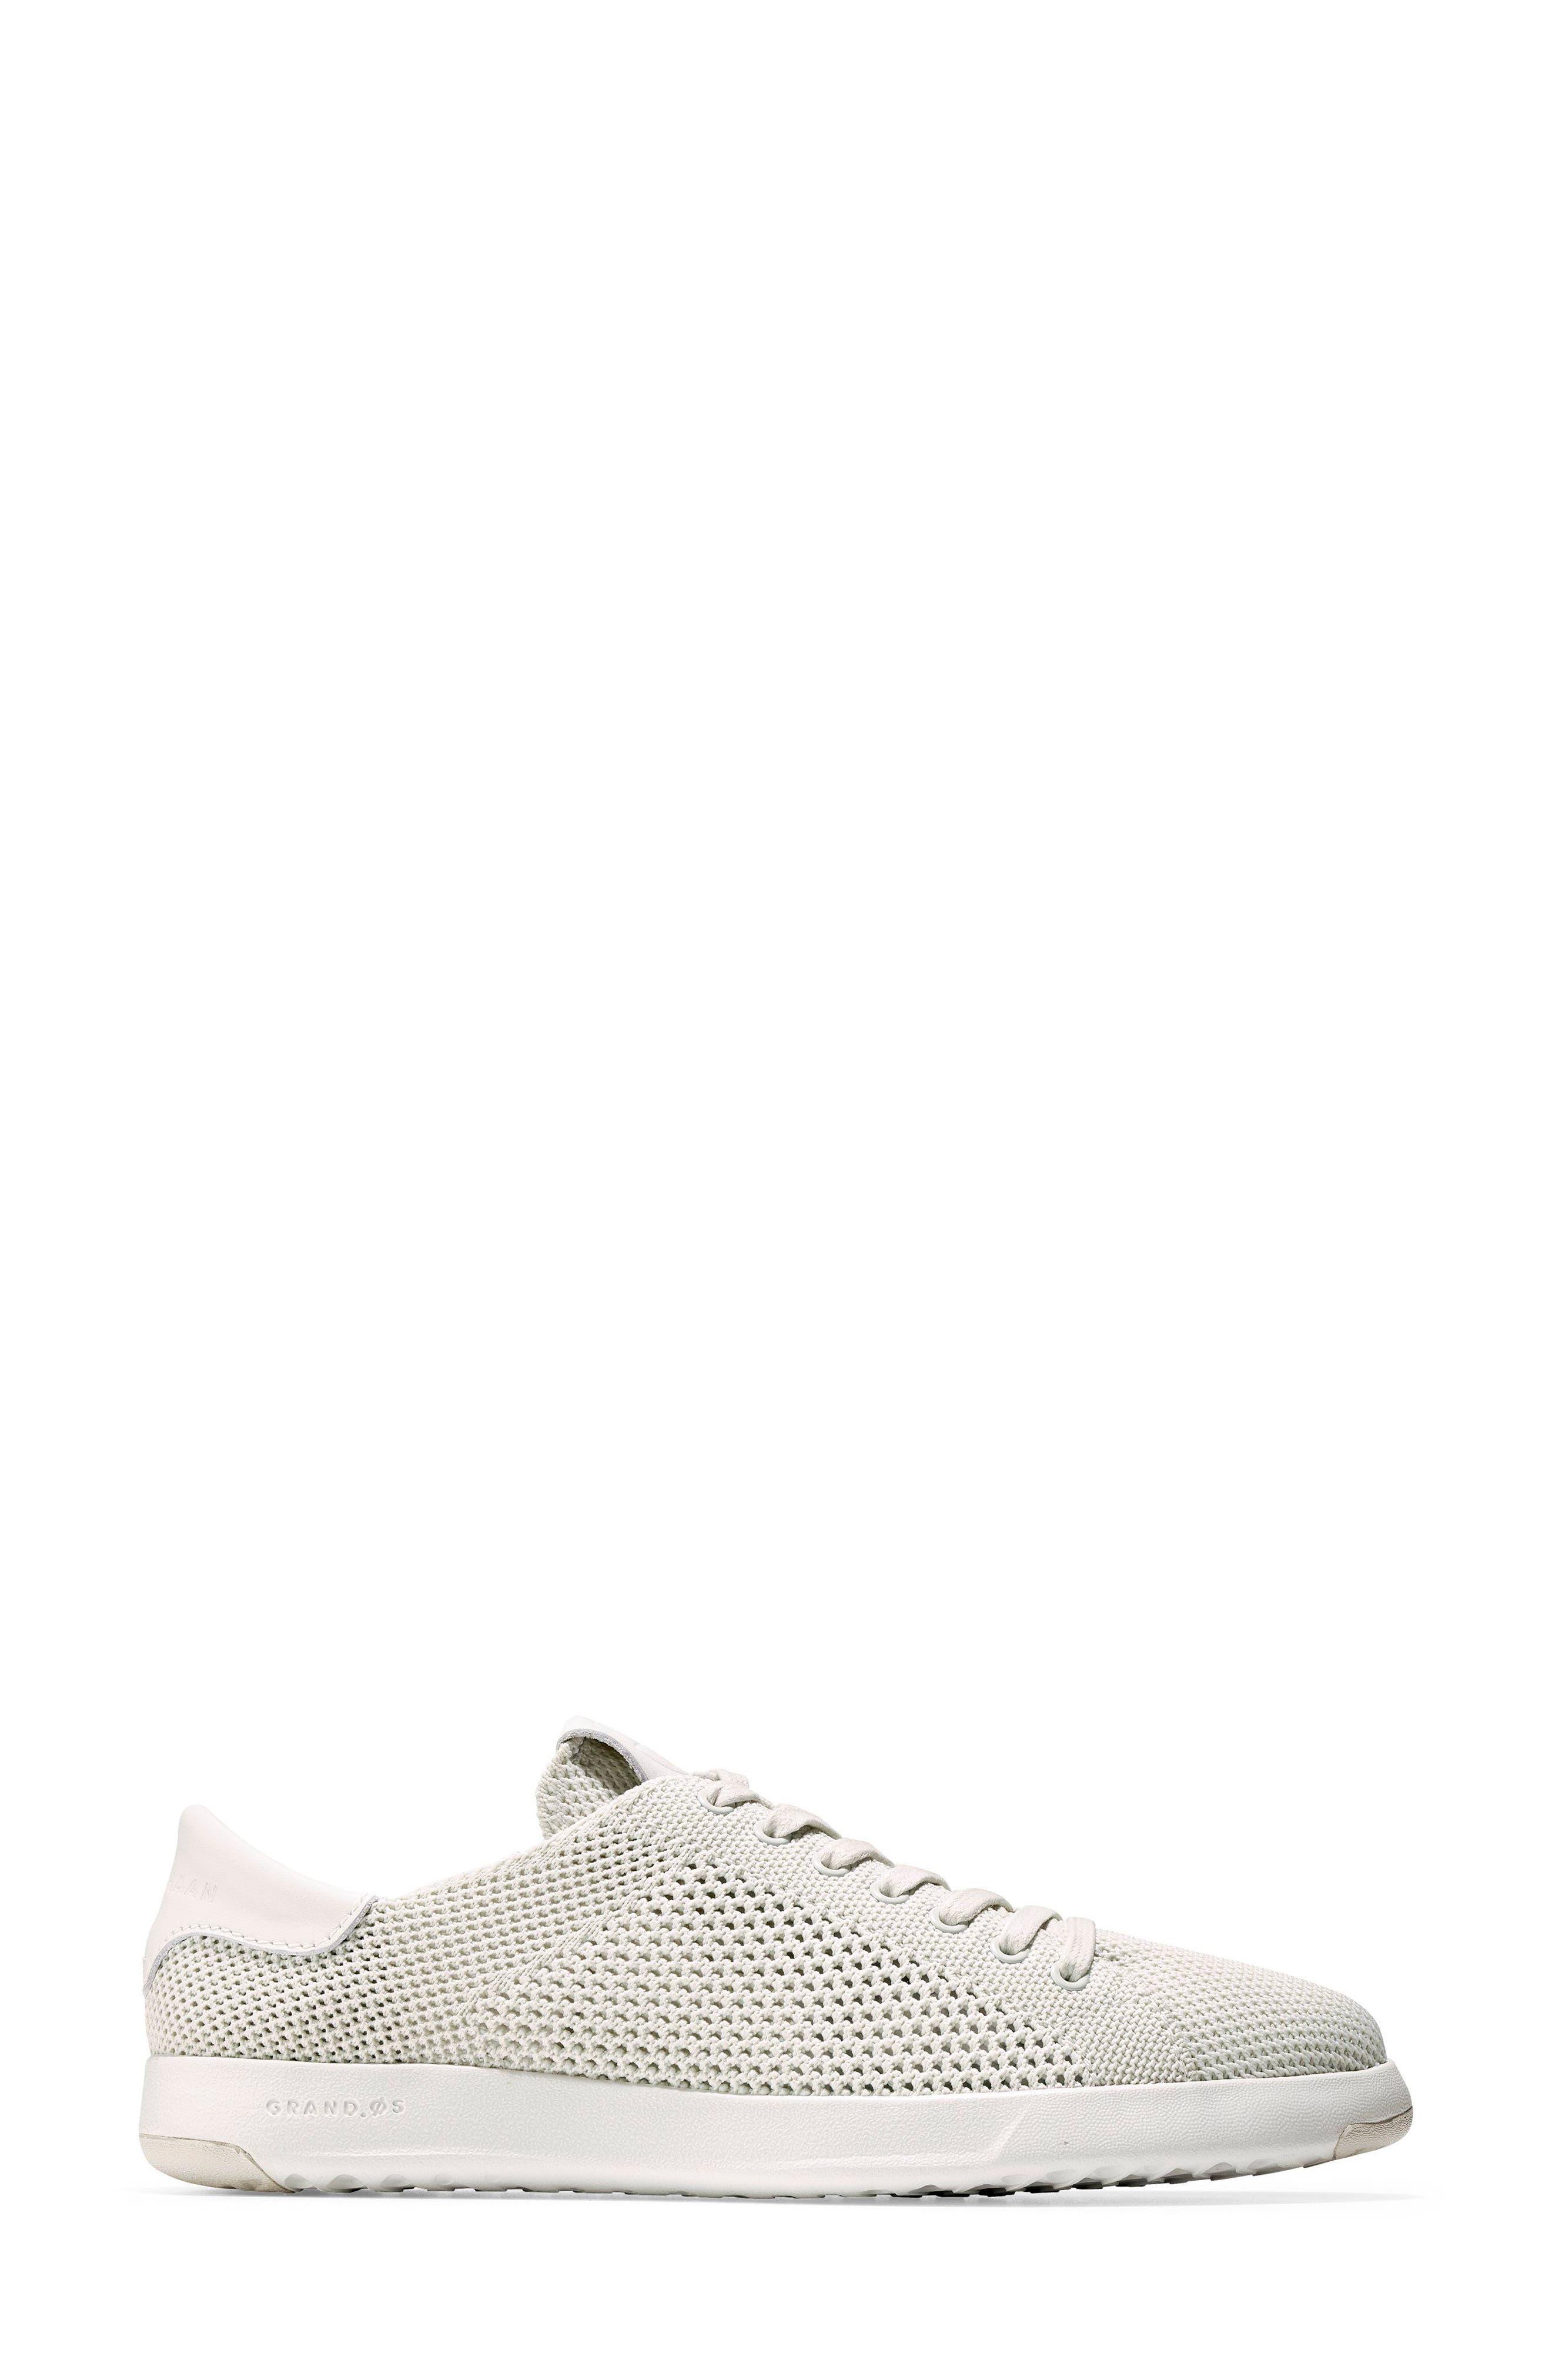 GrandPro Stitchlite Sneaker,                             Alternate thumbnail 3, color,                             CHALK FABRIC